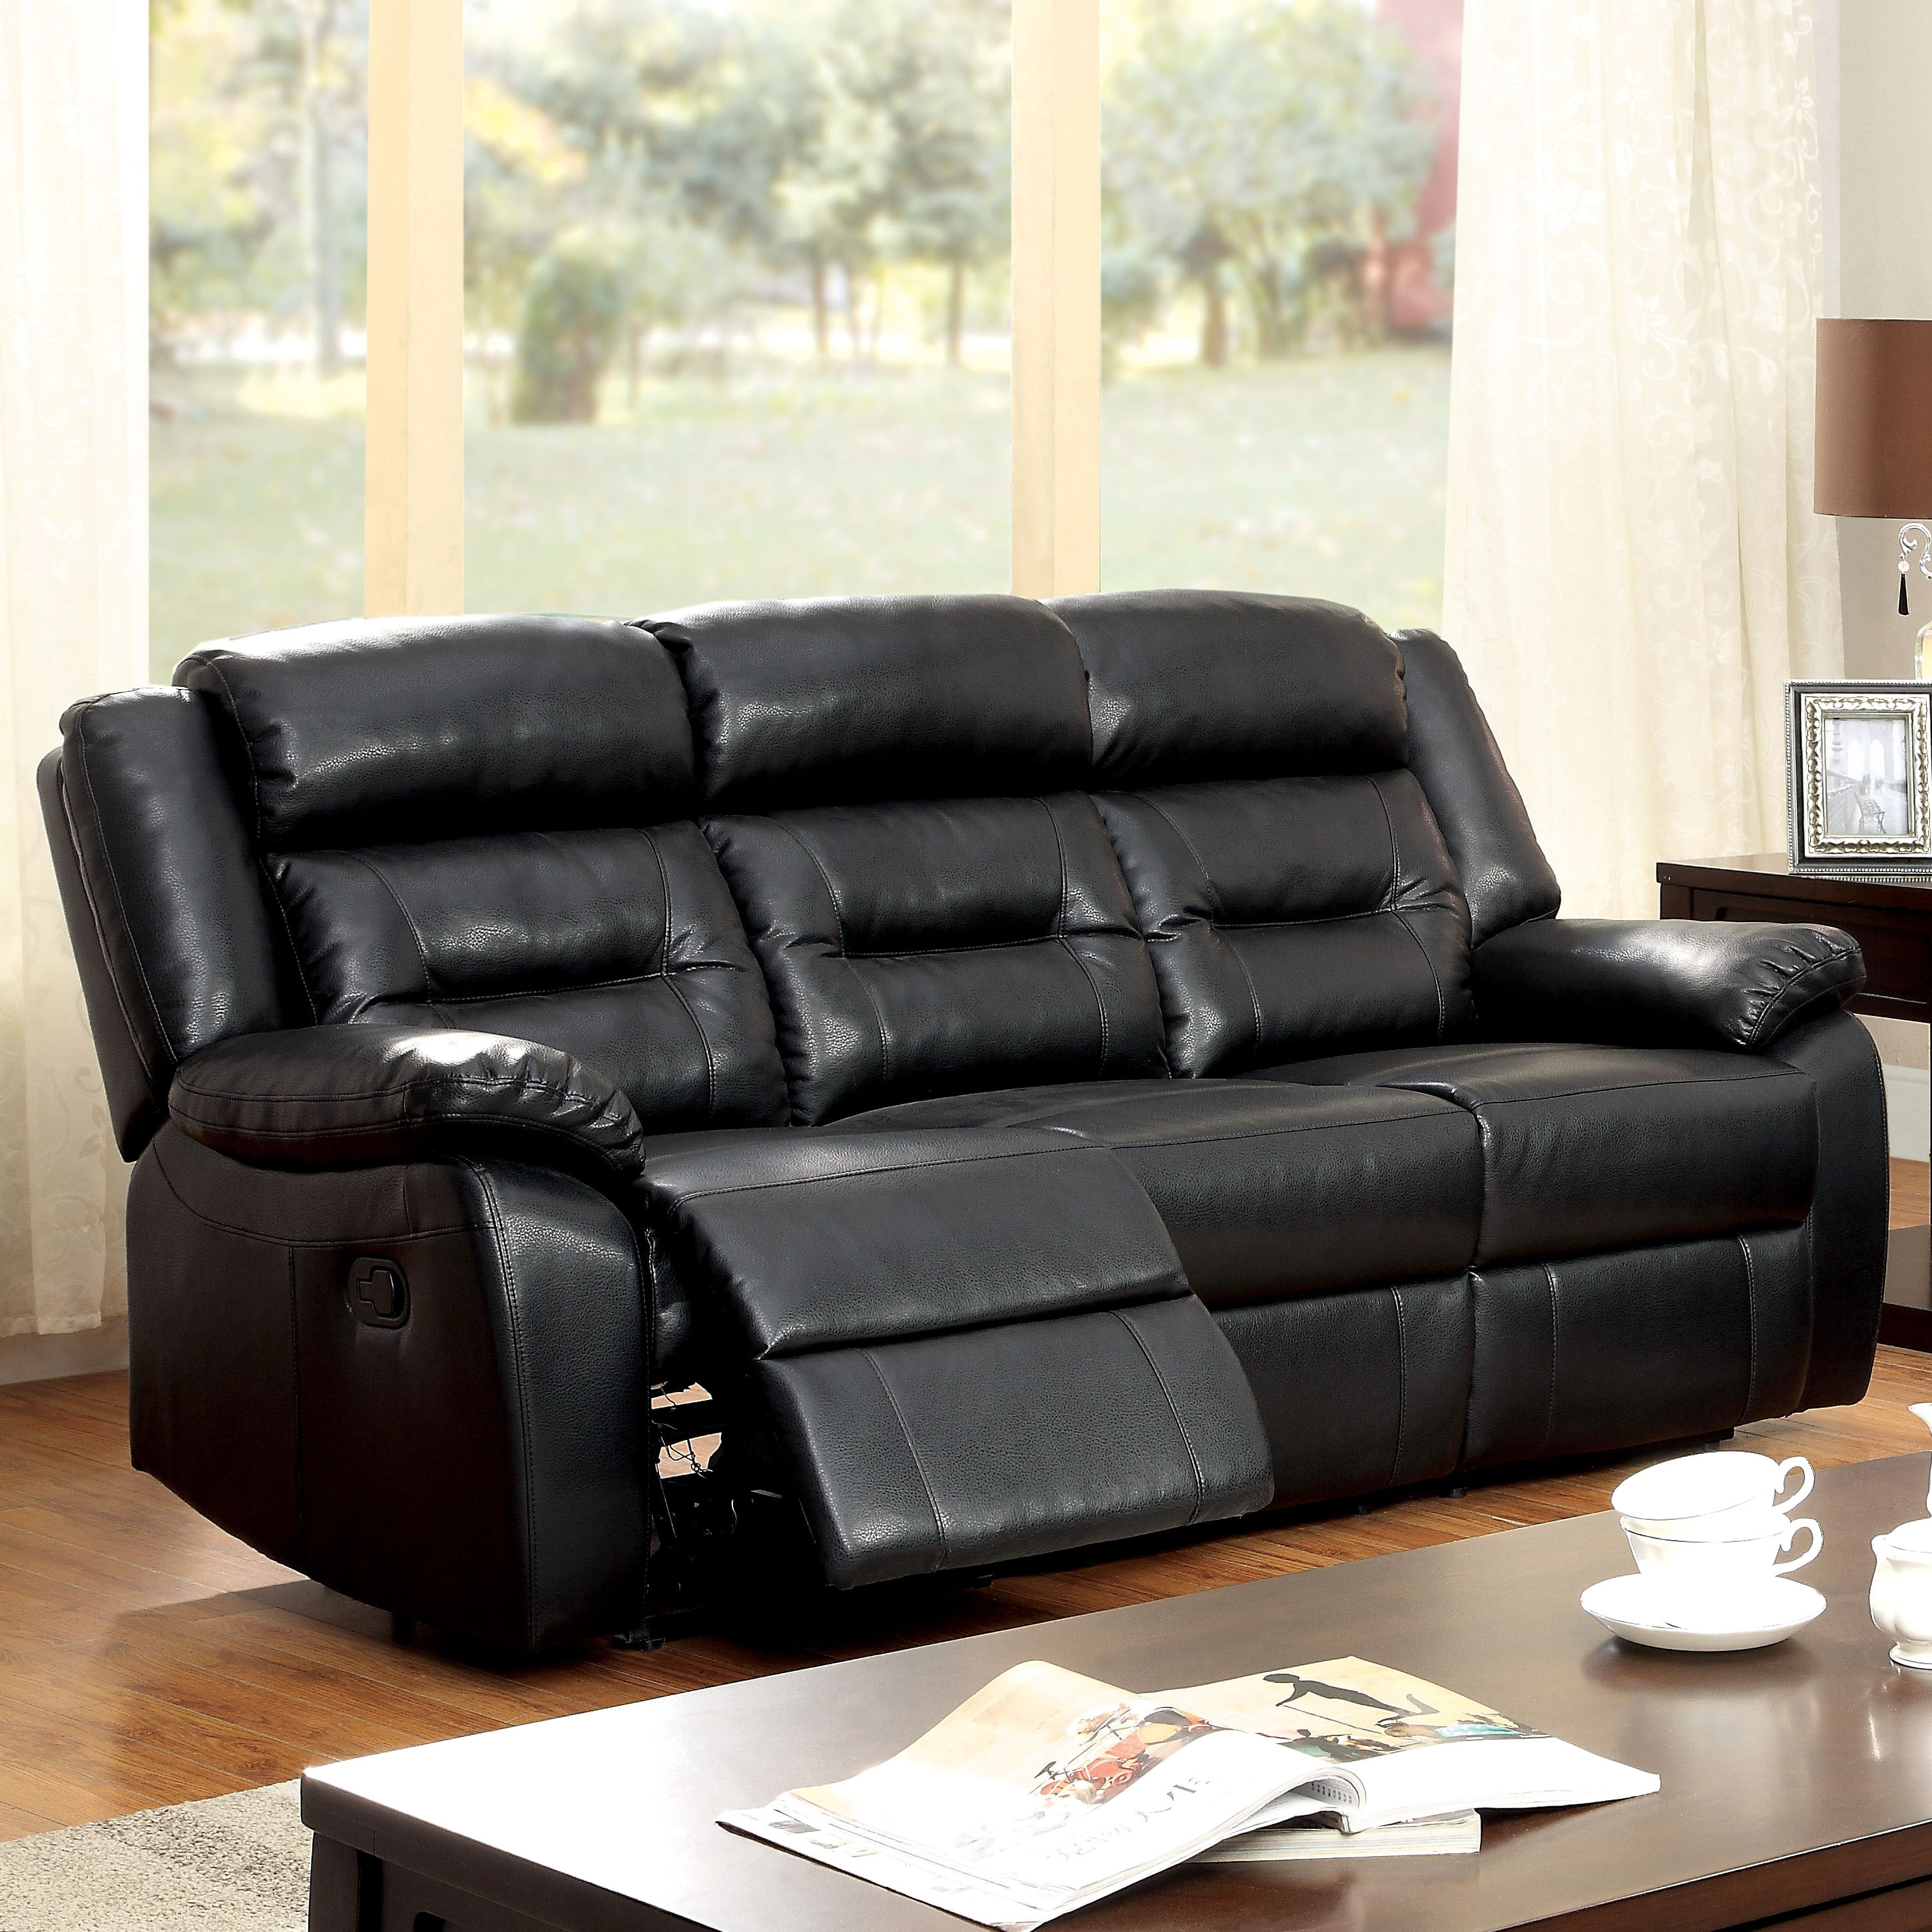 Furniture of America Garzon Black Bonded Leather Reclinin...